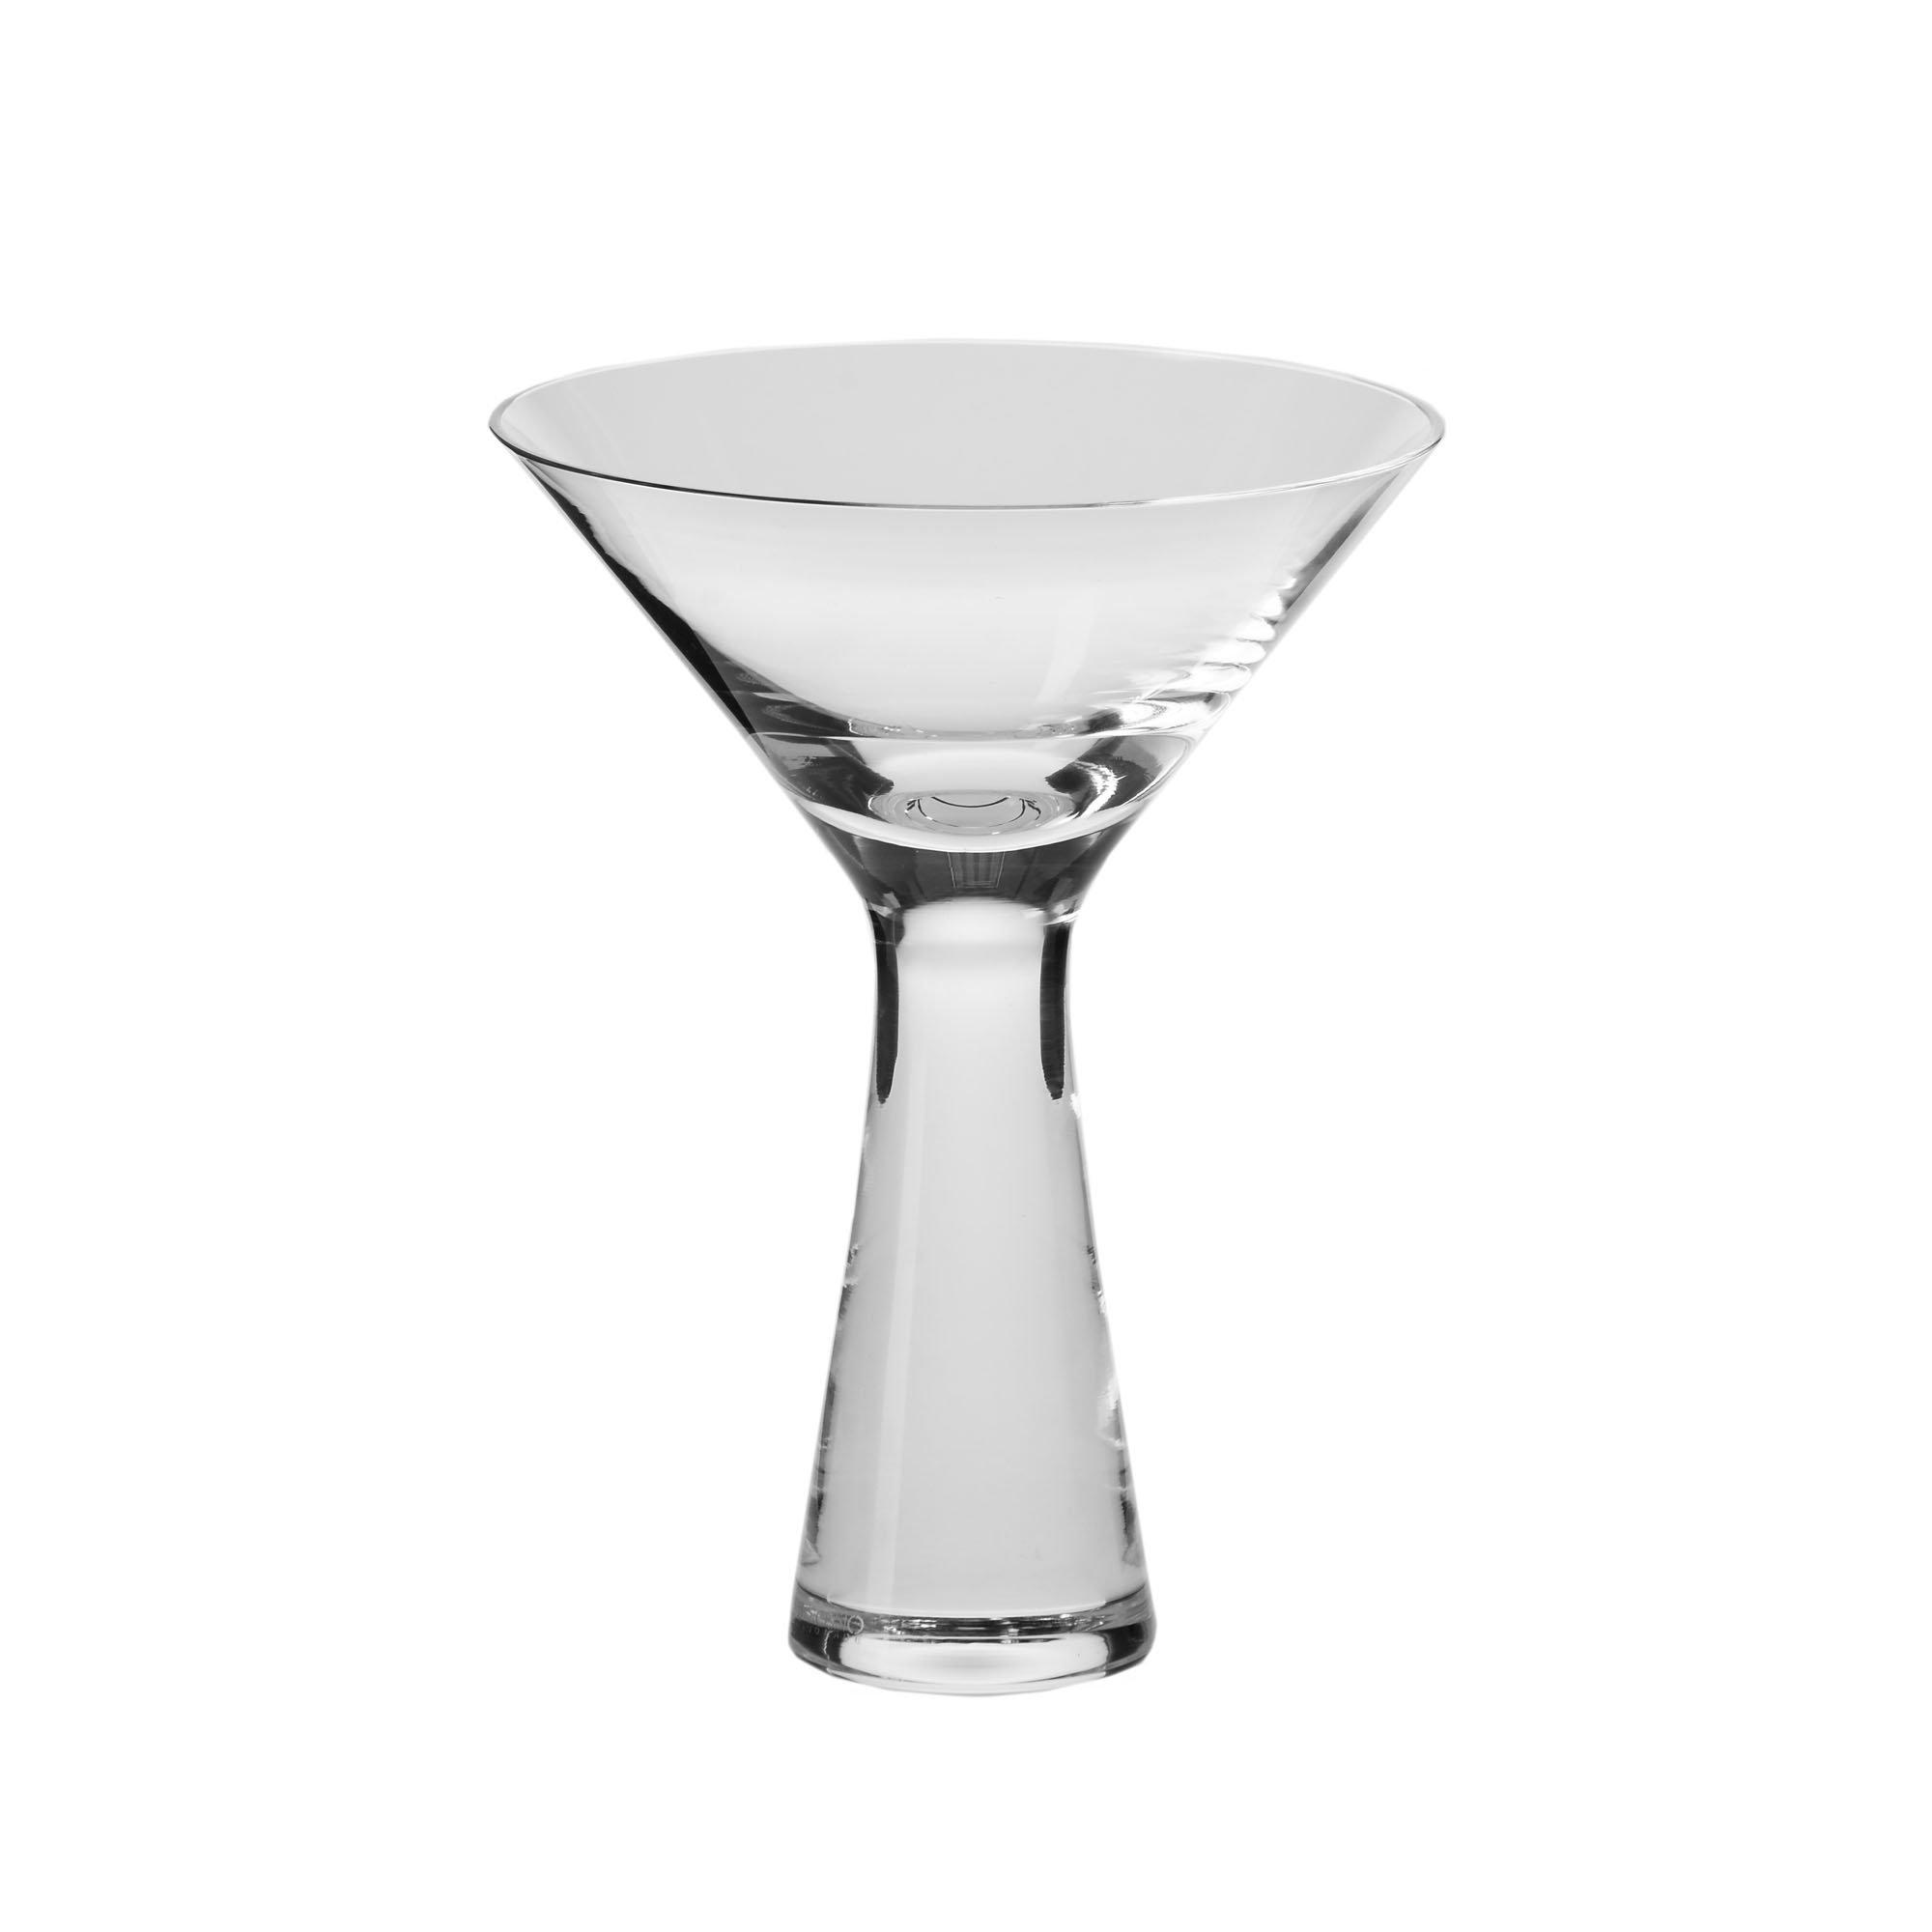 Household Essentials KROSNO Handmade Kai Martini Glasses (Set of 4), 8 oz, Clear